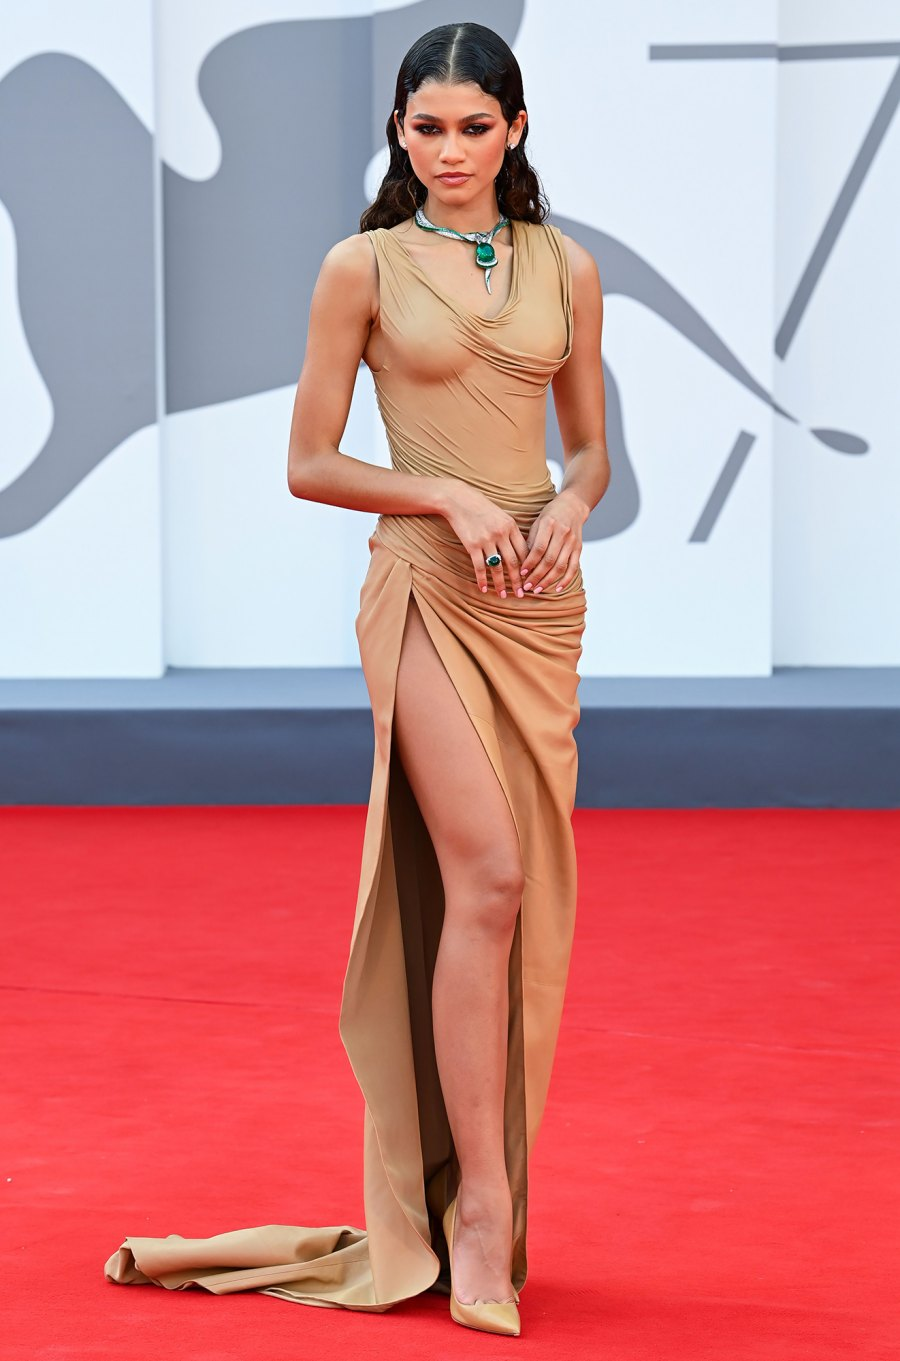 Zendaya's Balmain Gown Just Won the Venice Film Festival Red Carpet